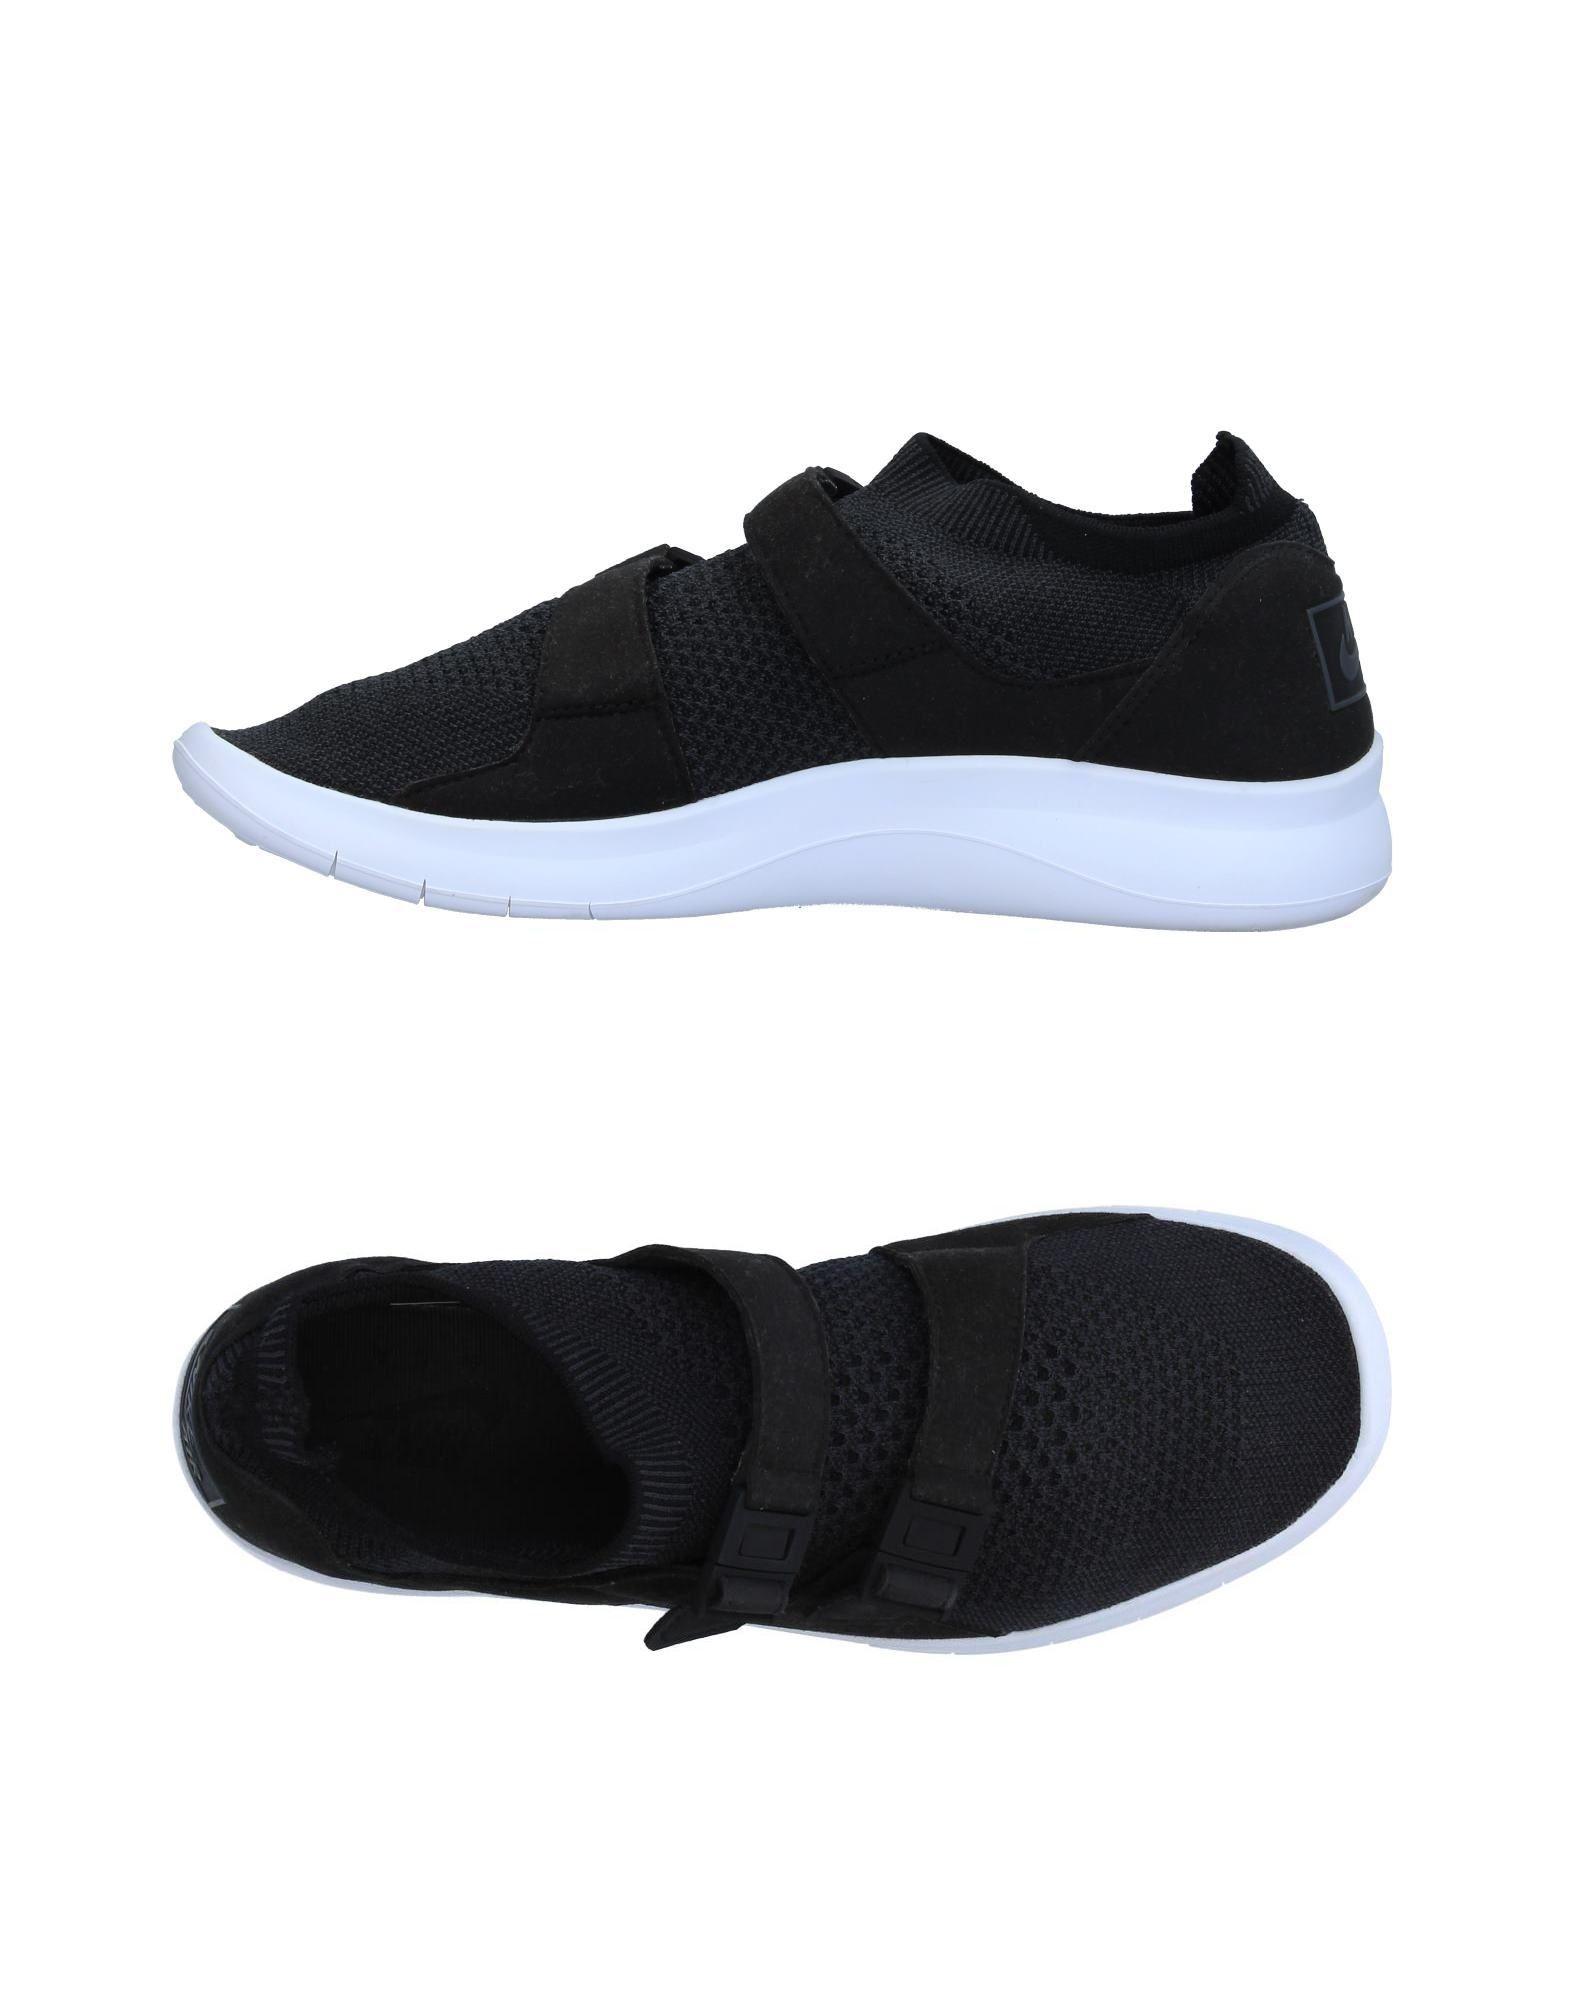 Rabatt echte Schuhe Nike Sneakers  Herren  Sneakers 11362512QJ 1f78a5